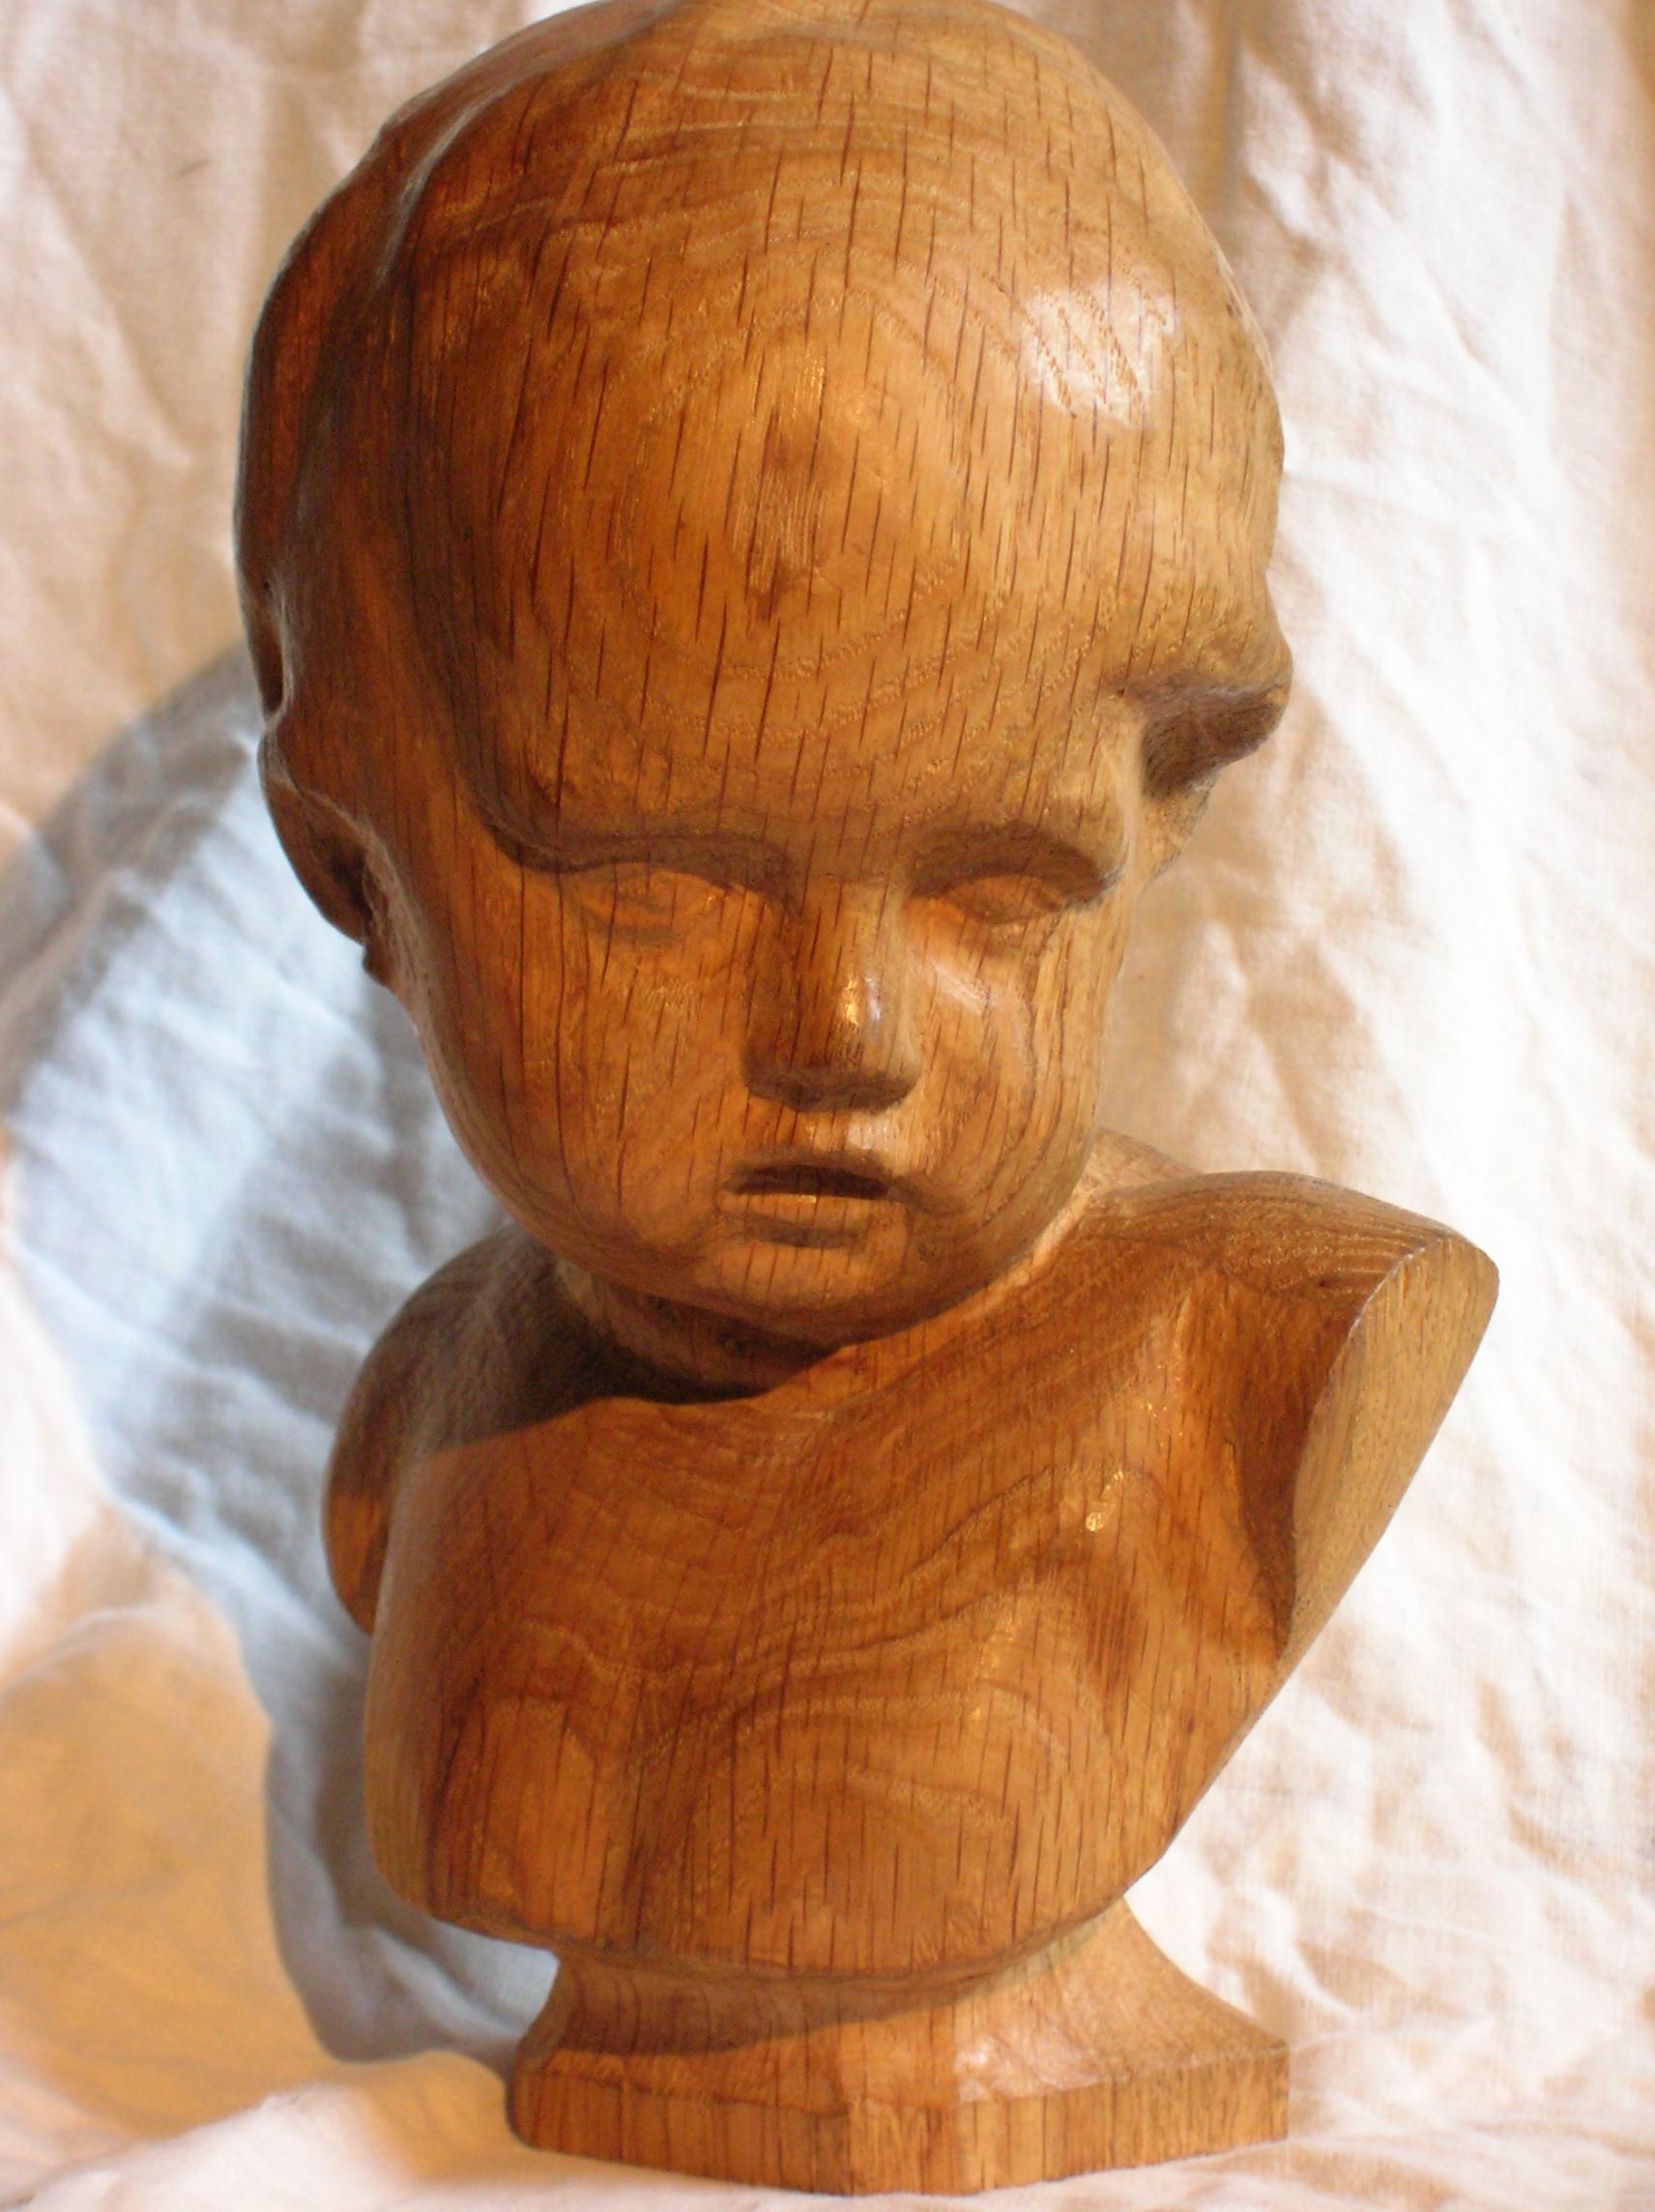 15 beeldhouwen ambachtelijk houtwerk thomas huyghe wortegem